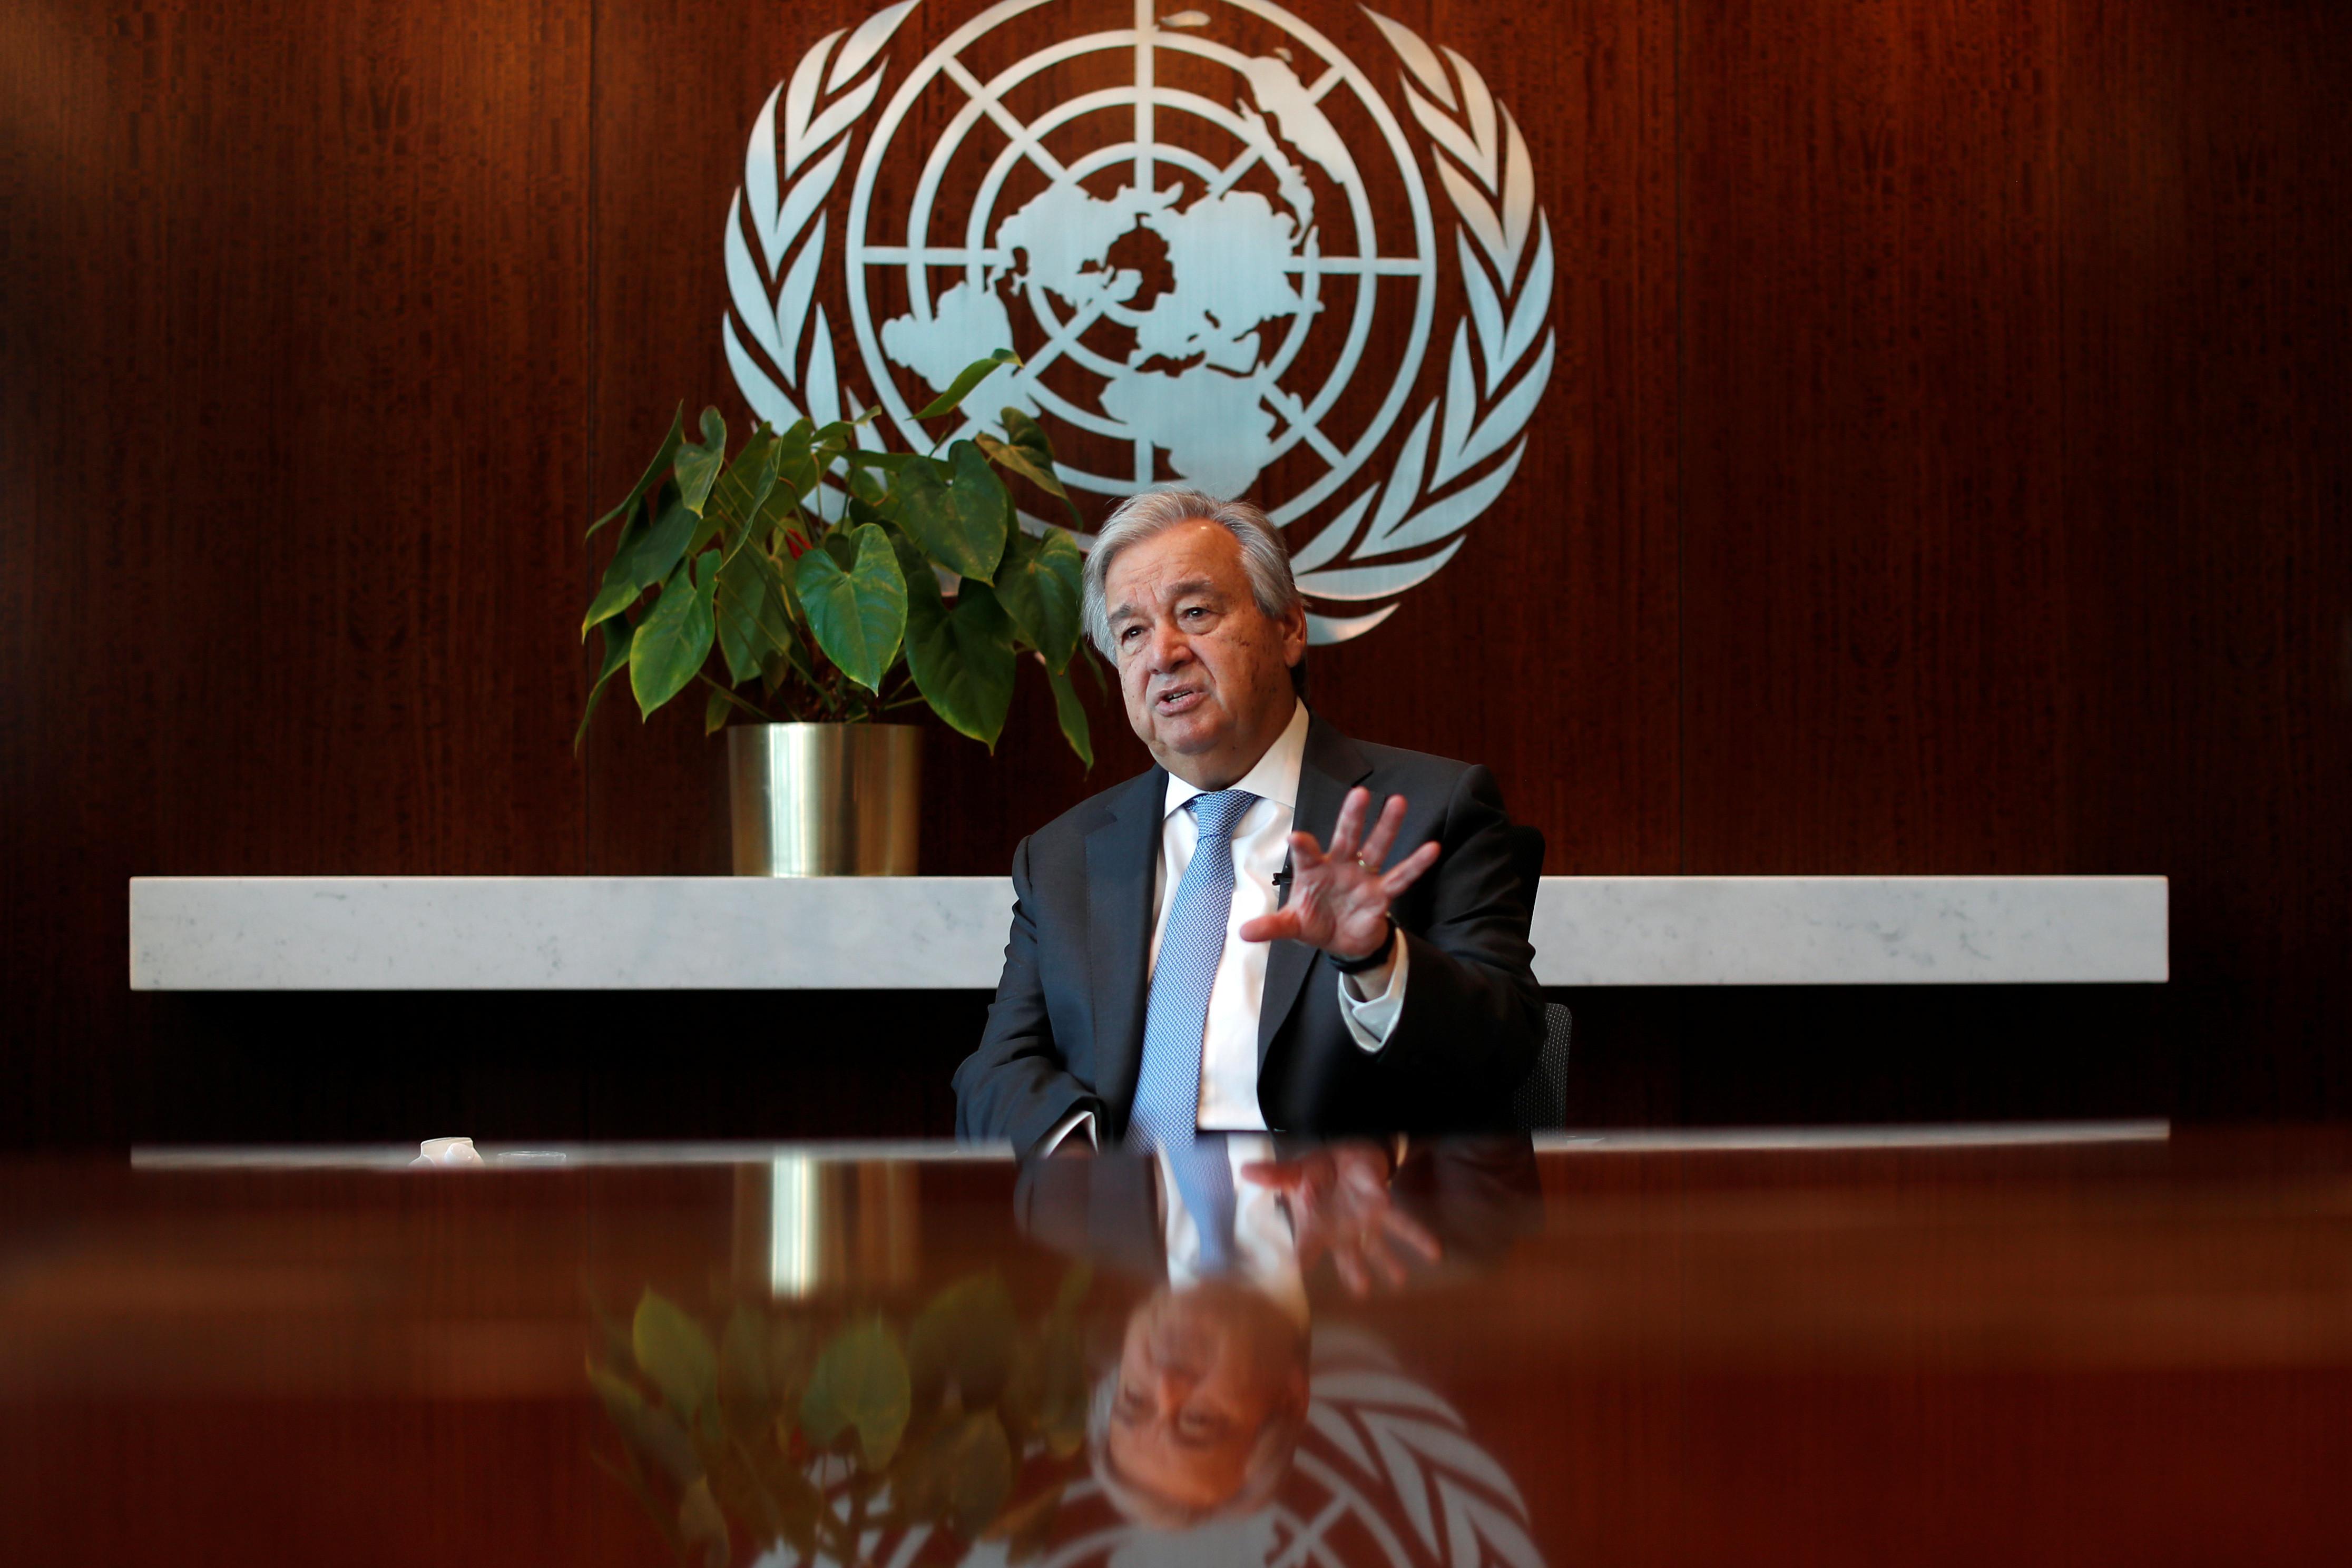 United Nations Secretary-General Antonio Guterres speaks during an interview with Reuters at U.N. headquarters in New York City, New York, U.S., September 14, 2020. Picture taken September 14, 2020. REUTERS/Mike Segar - RC2WYI9DGFV8